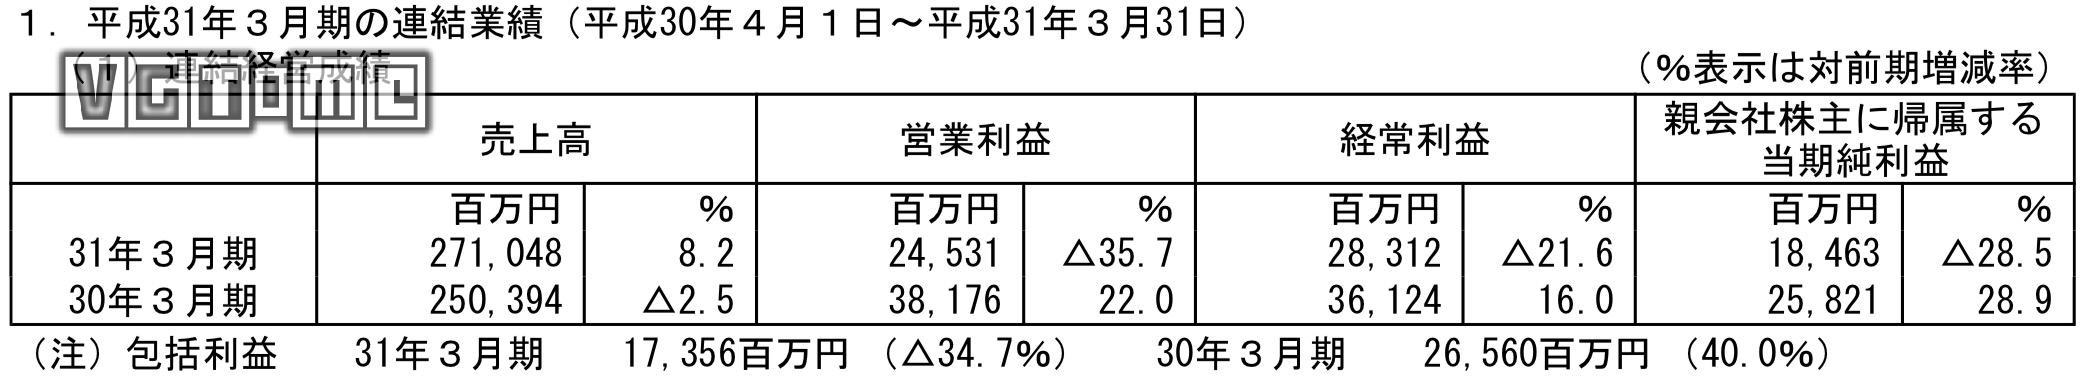 Square Enix去年游戏业务收入提升,但利润下滑21.6%